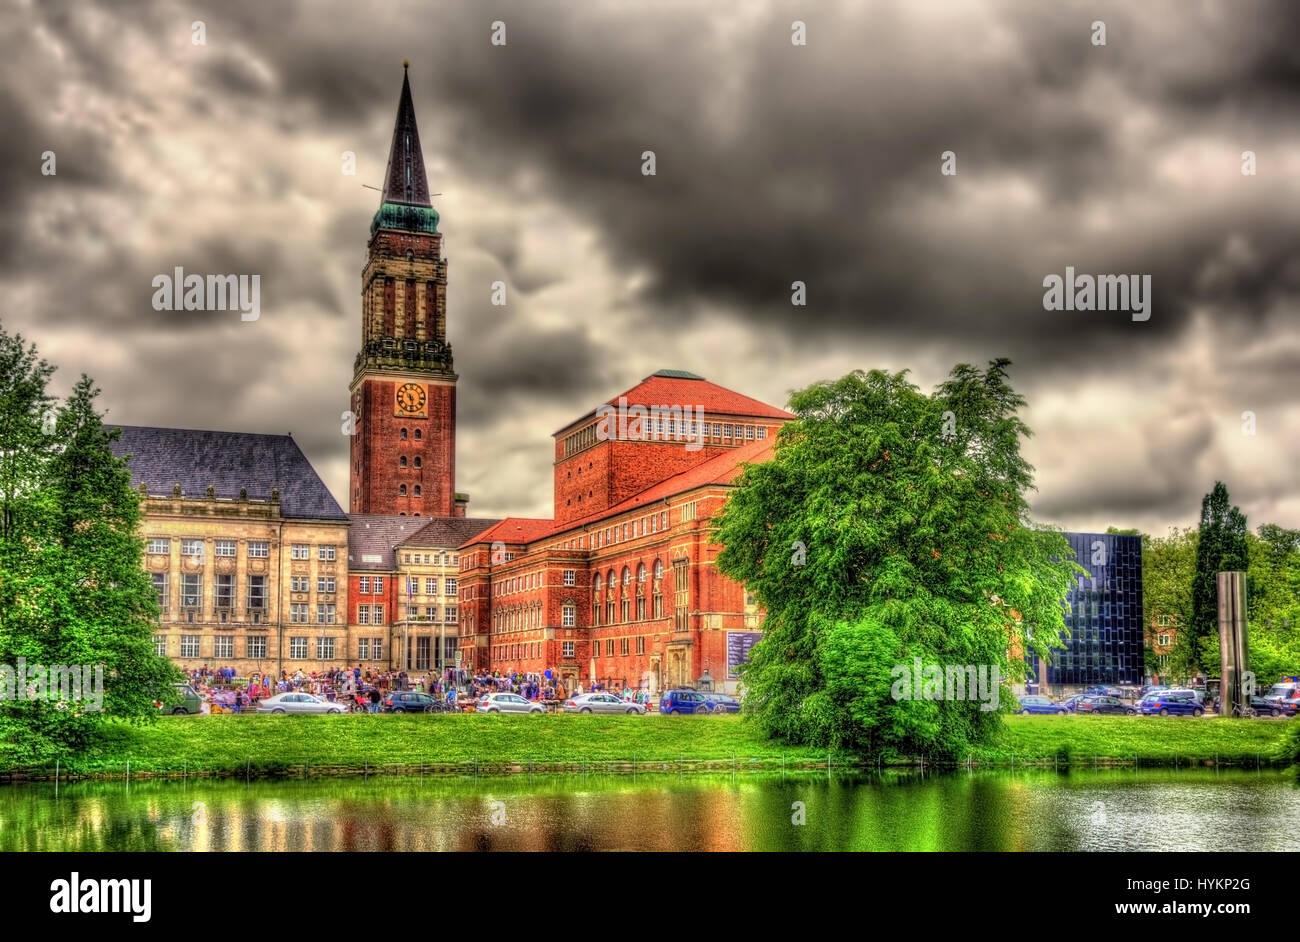 View of Kiel city hall - Germany - Stock Image